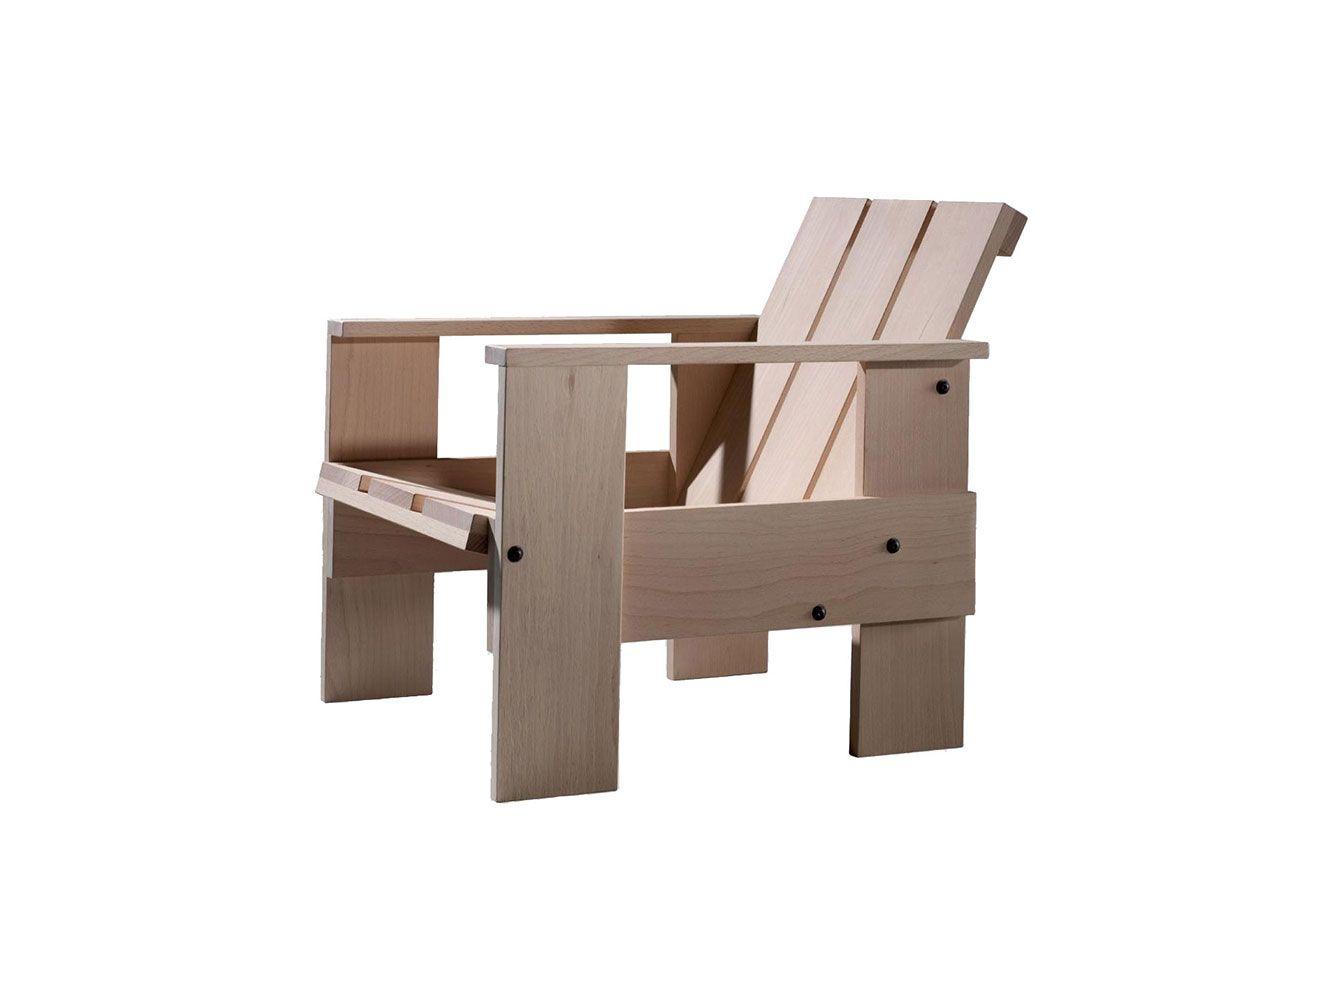 rietveld chair plans - Buscar con Google   Jardin muebles ...